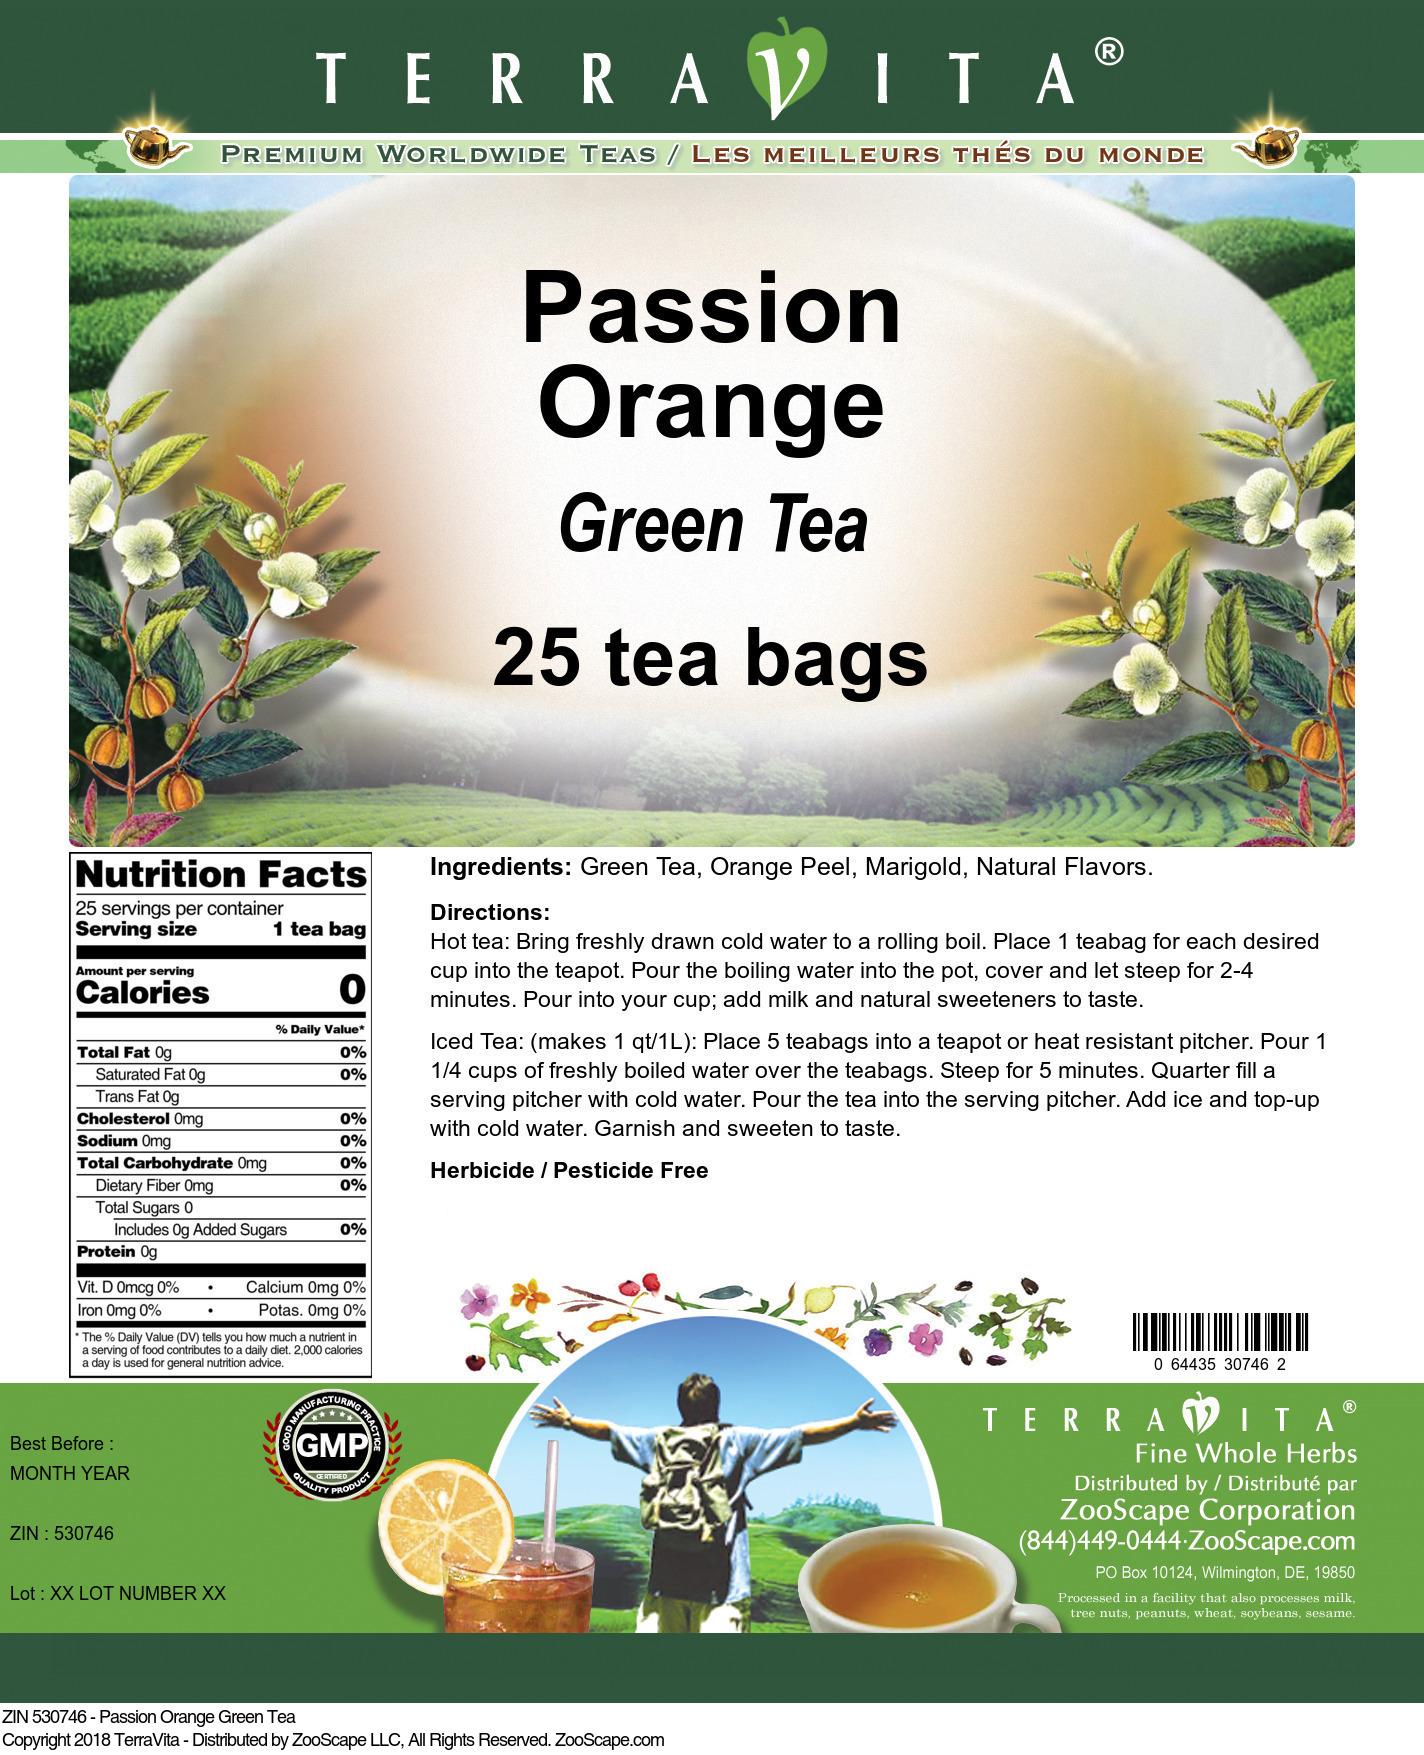 Passion Orange Green Tea